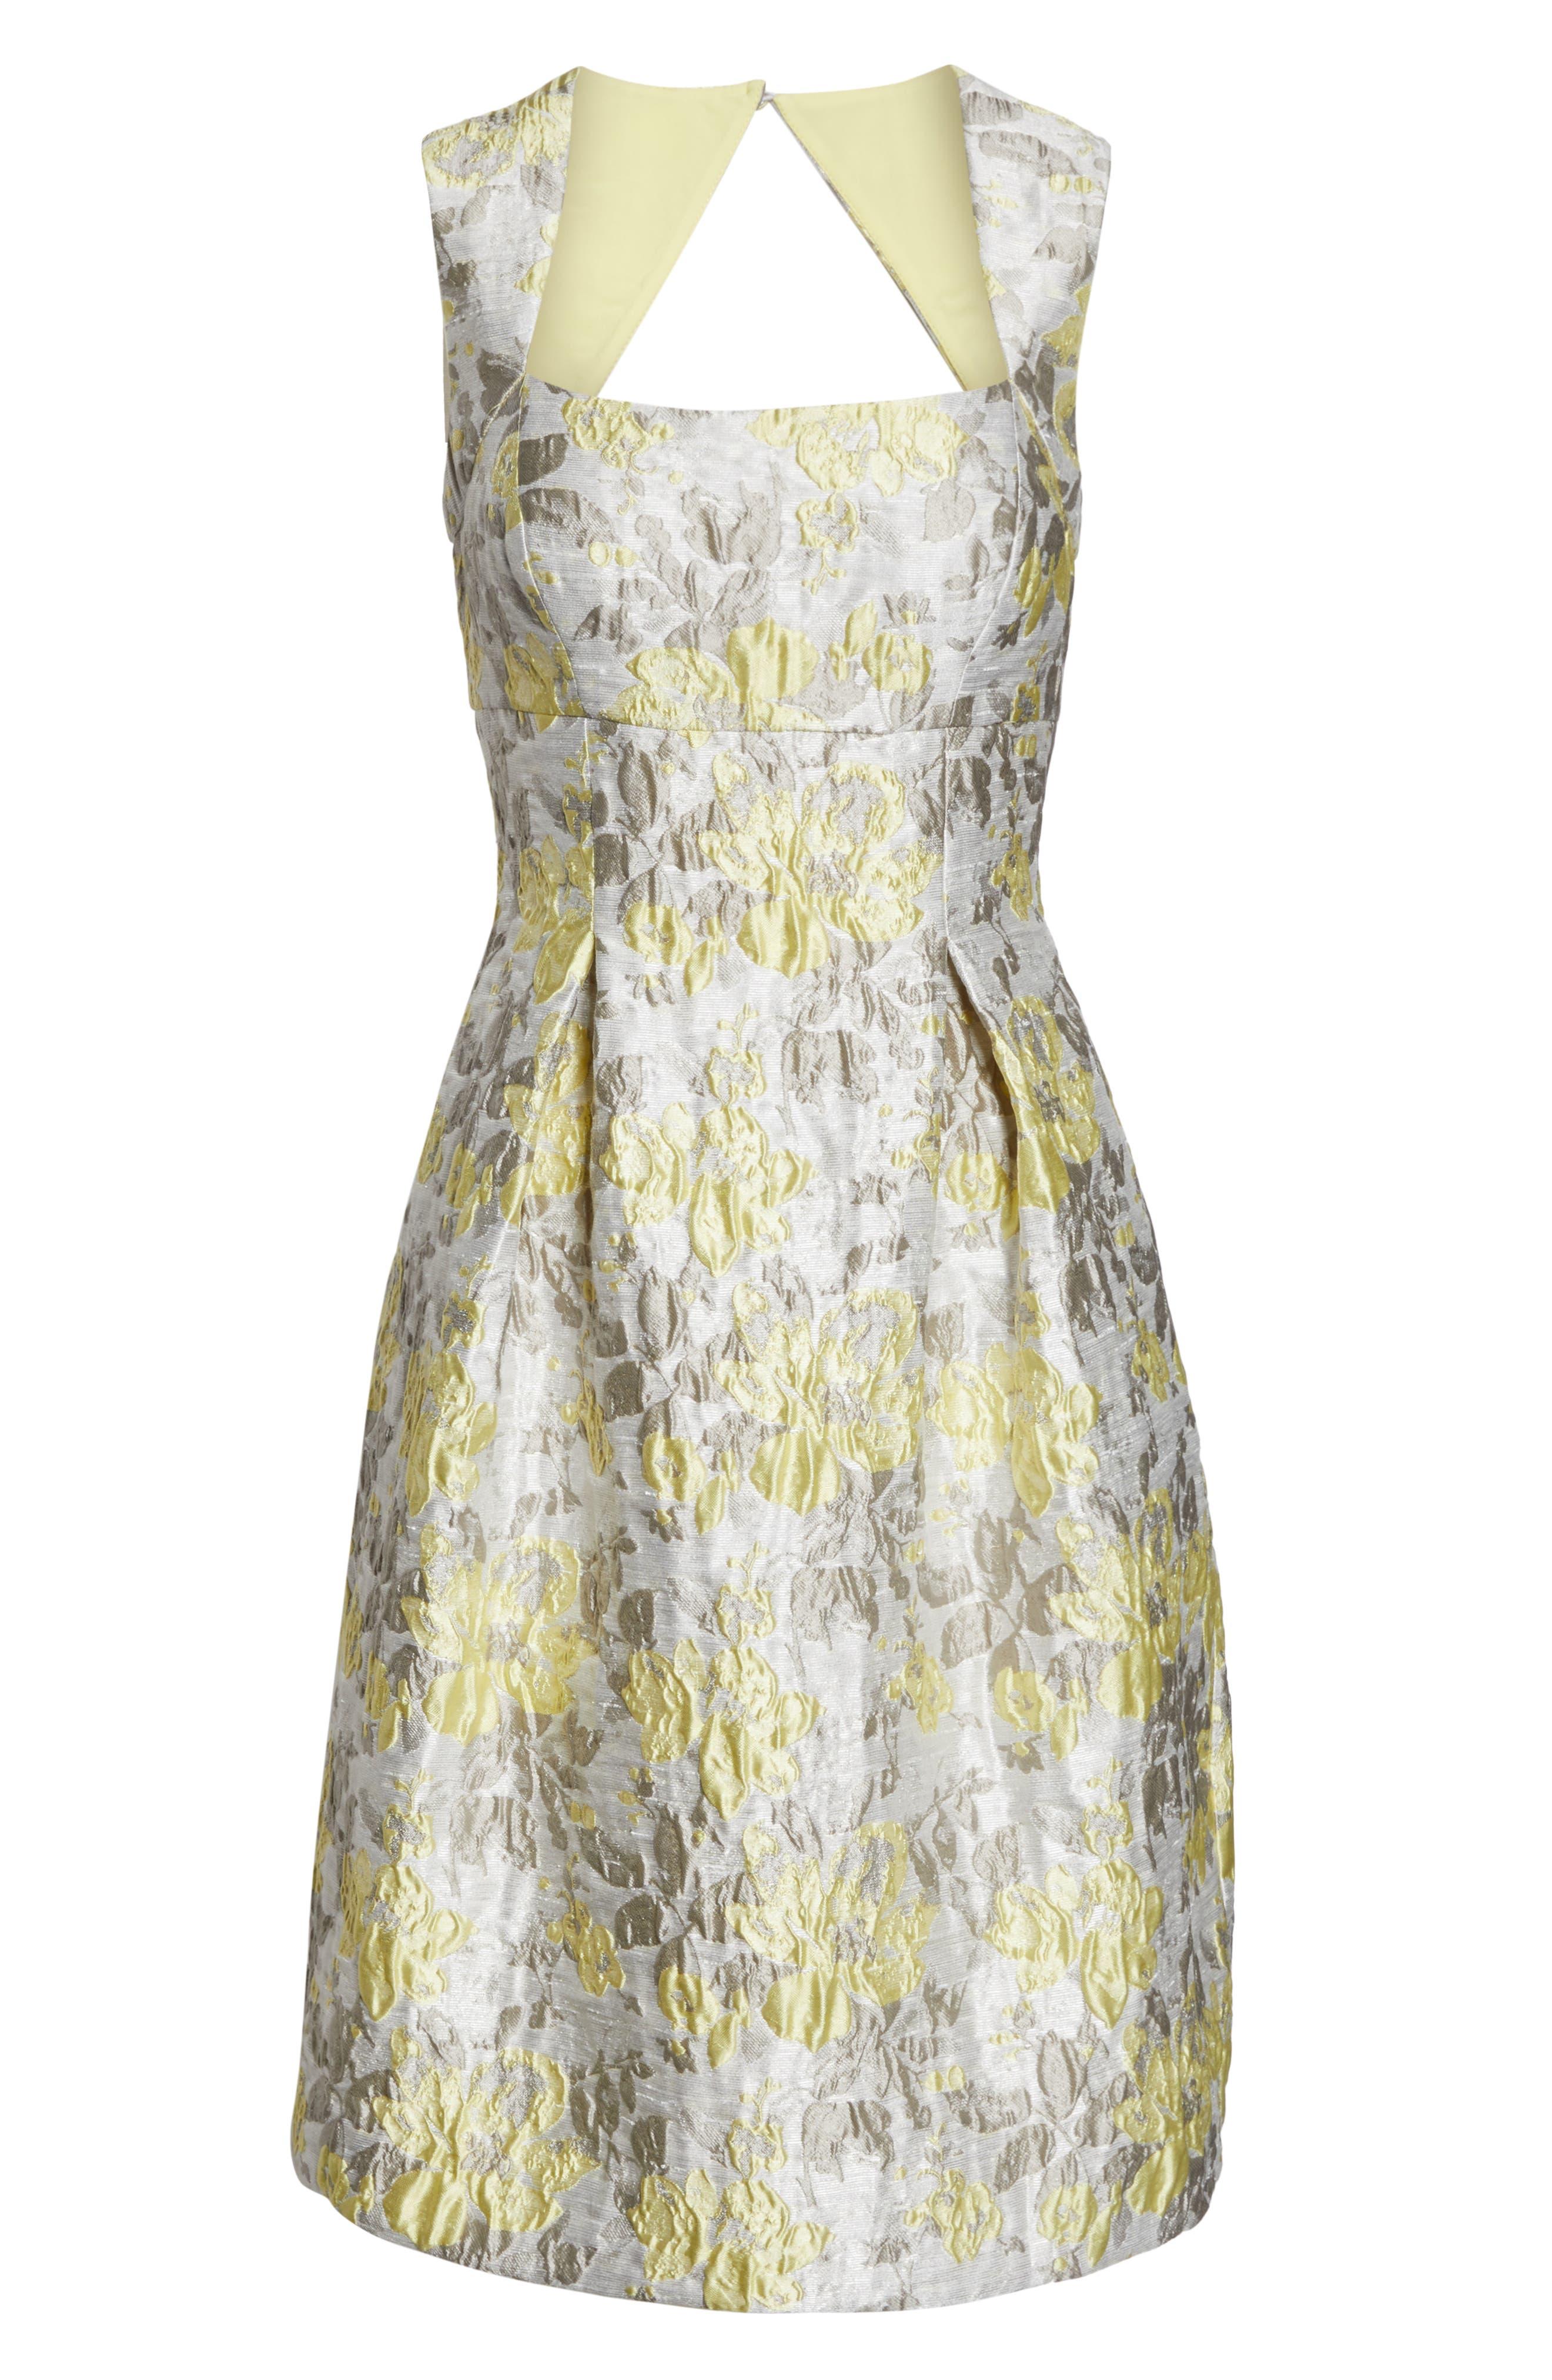 ELIZA J,                             Floral Jacquard Fit & Flare Dress,                             Alternate thumbnail 7, color,                             SILVER COMBO